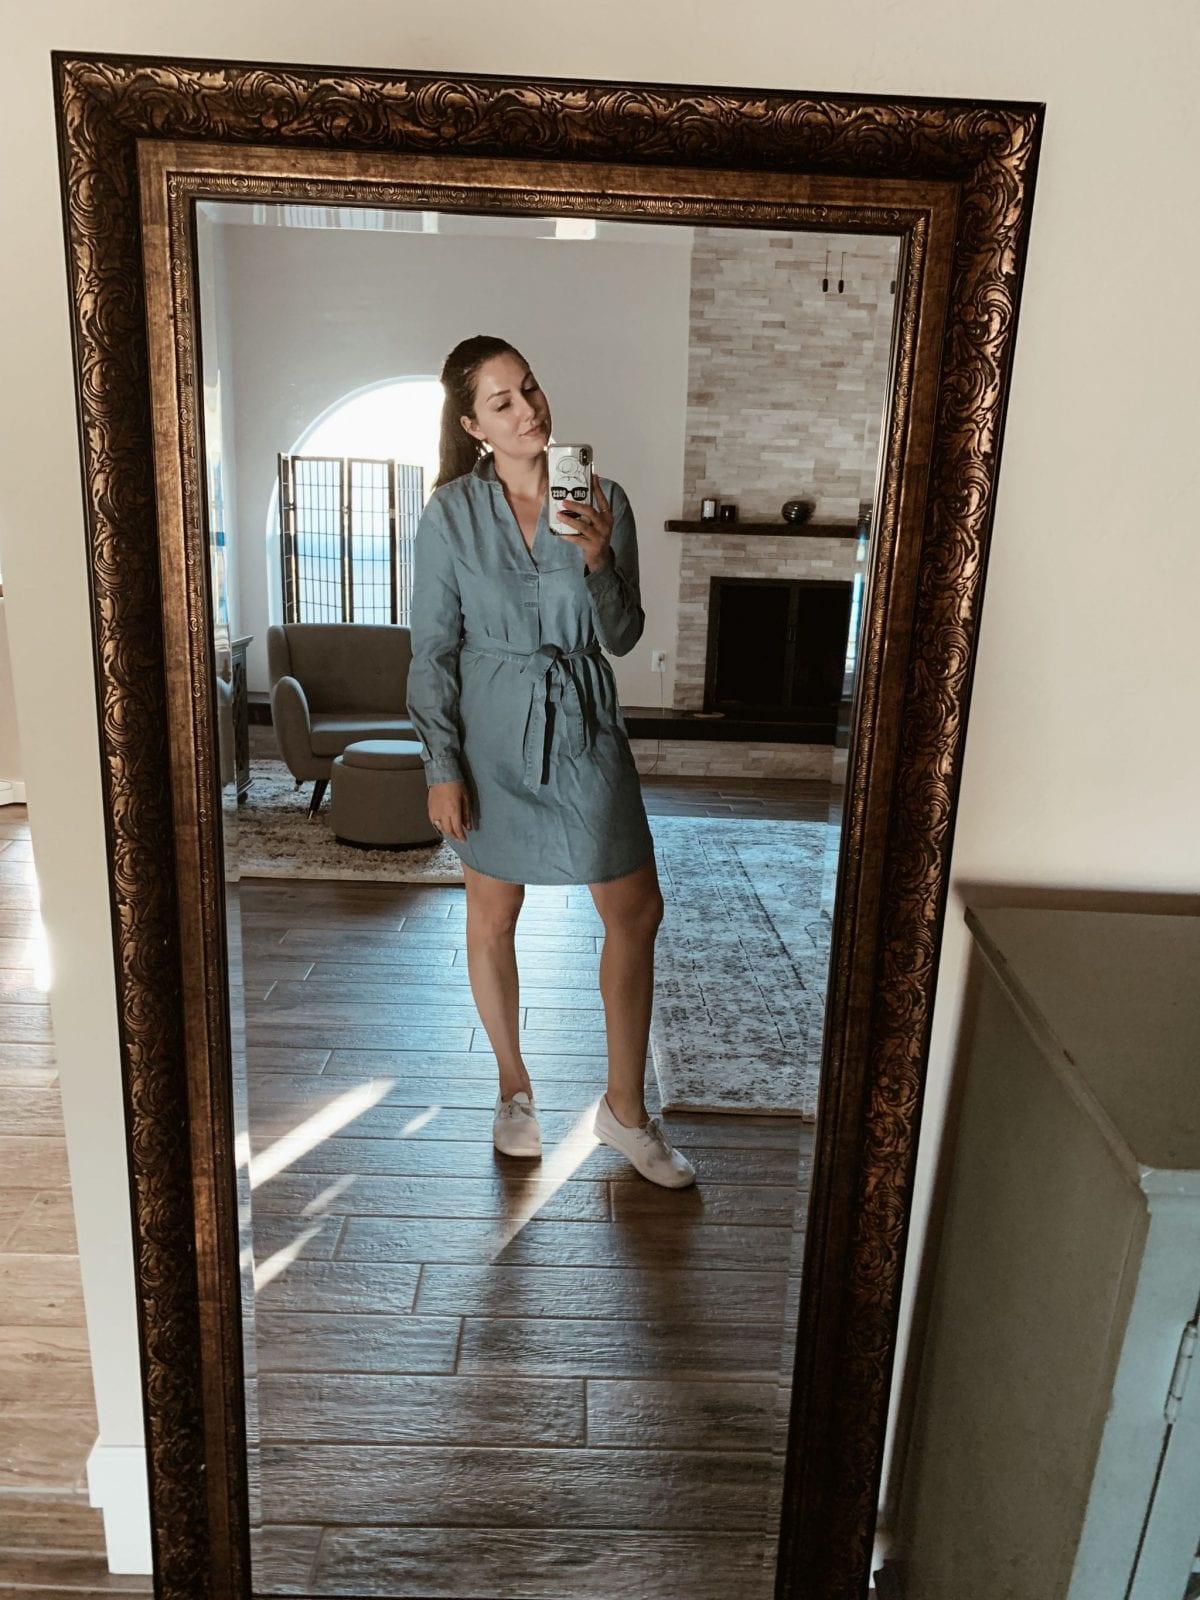 Taking a mirror selfie rocking the denim dress.